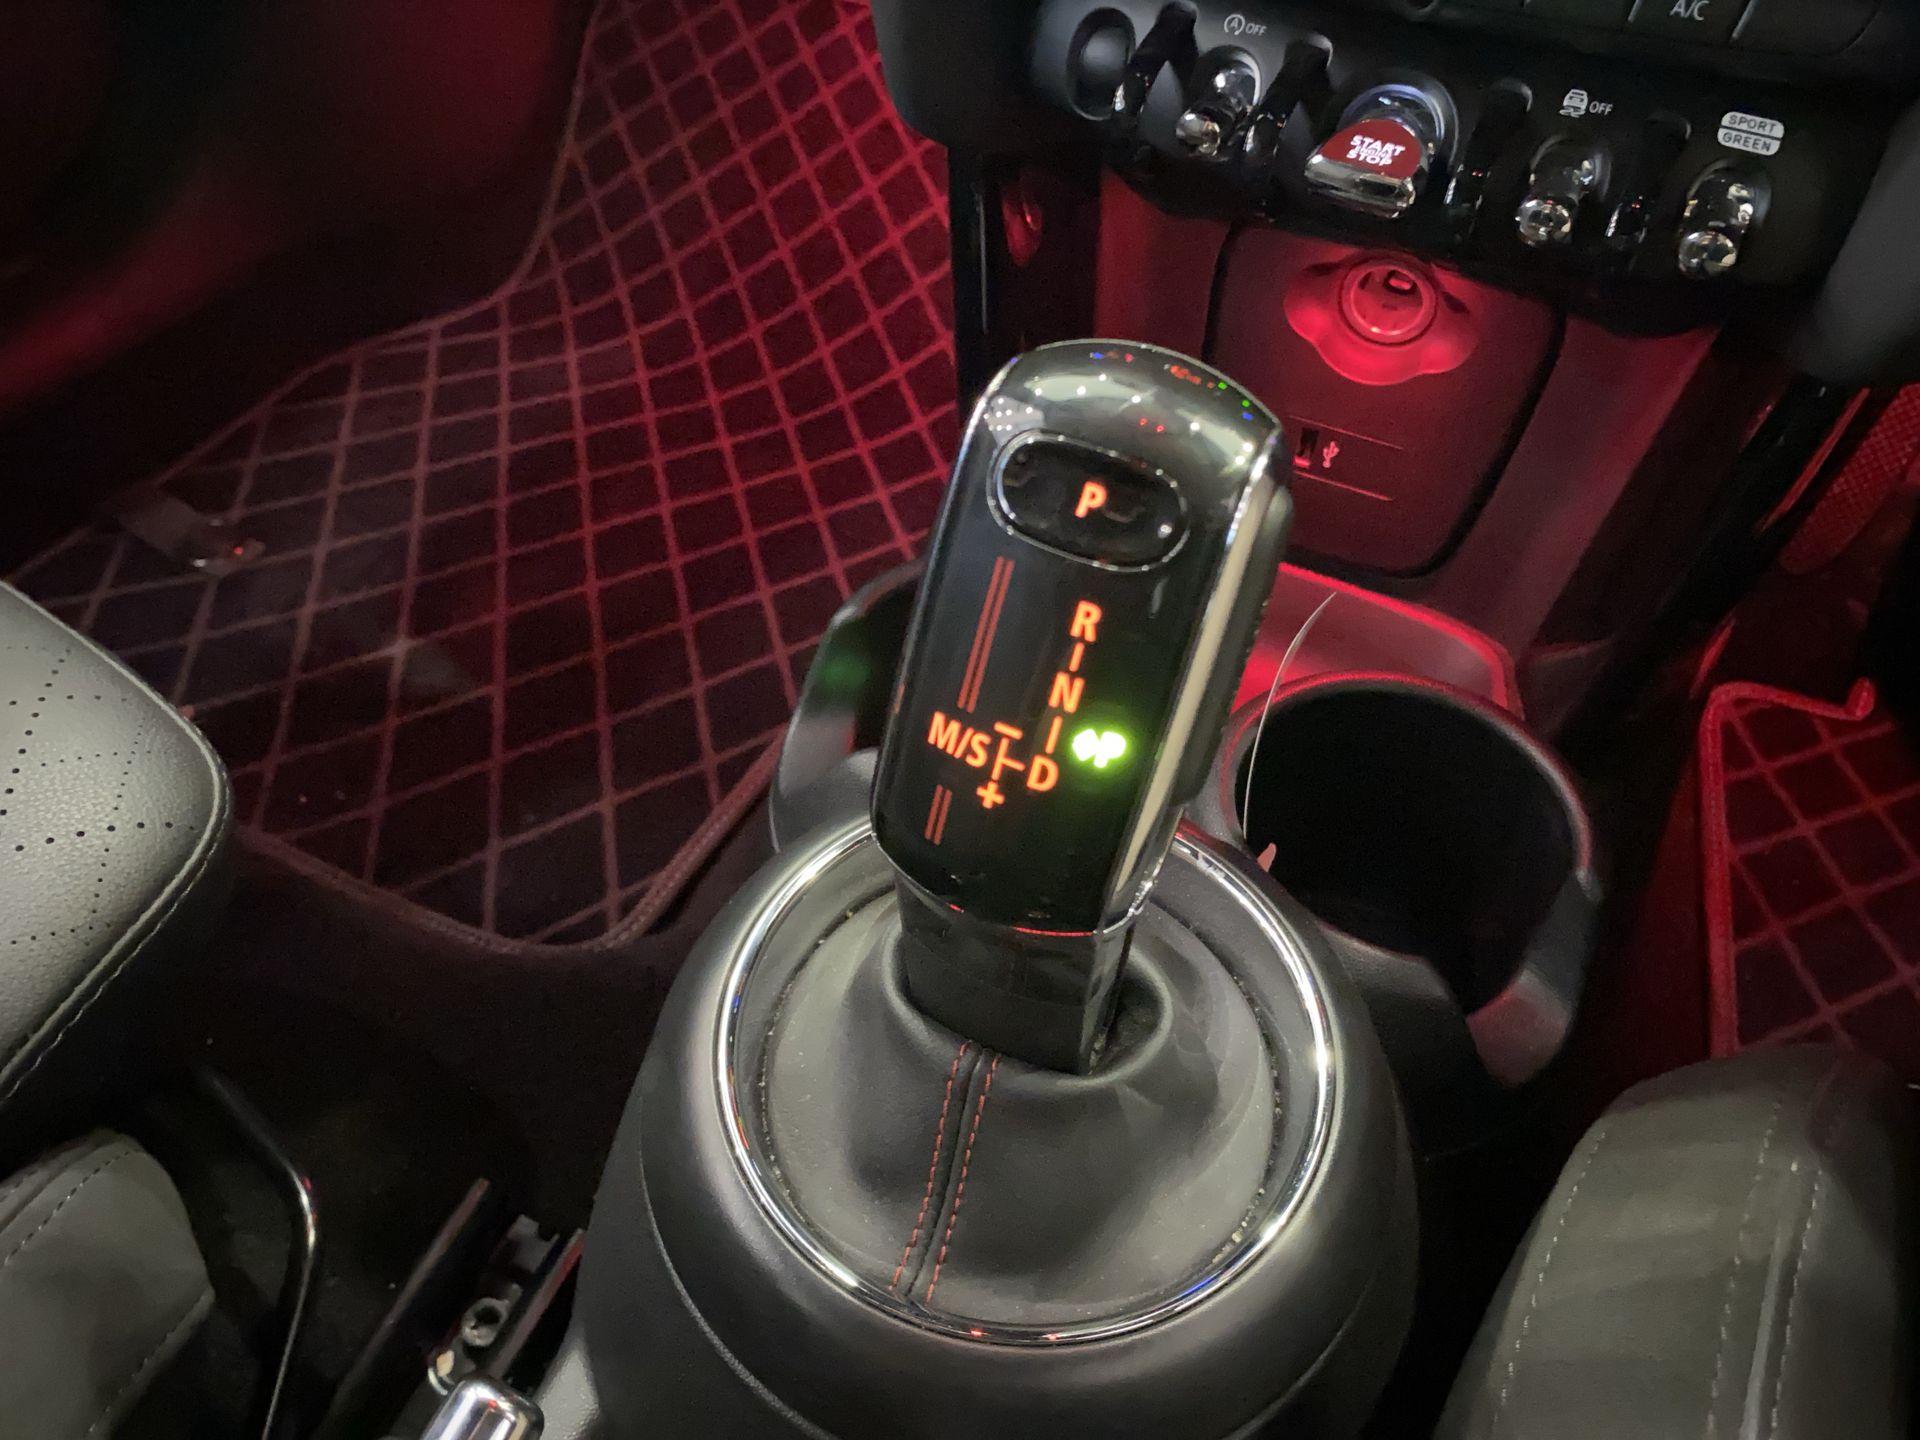 2018 MINI Cooper S 3Dr